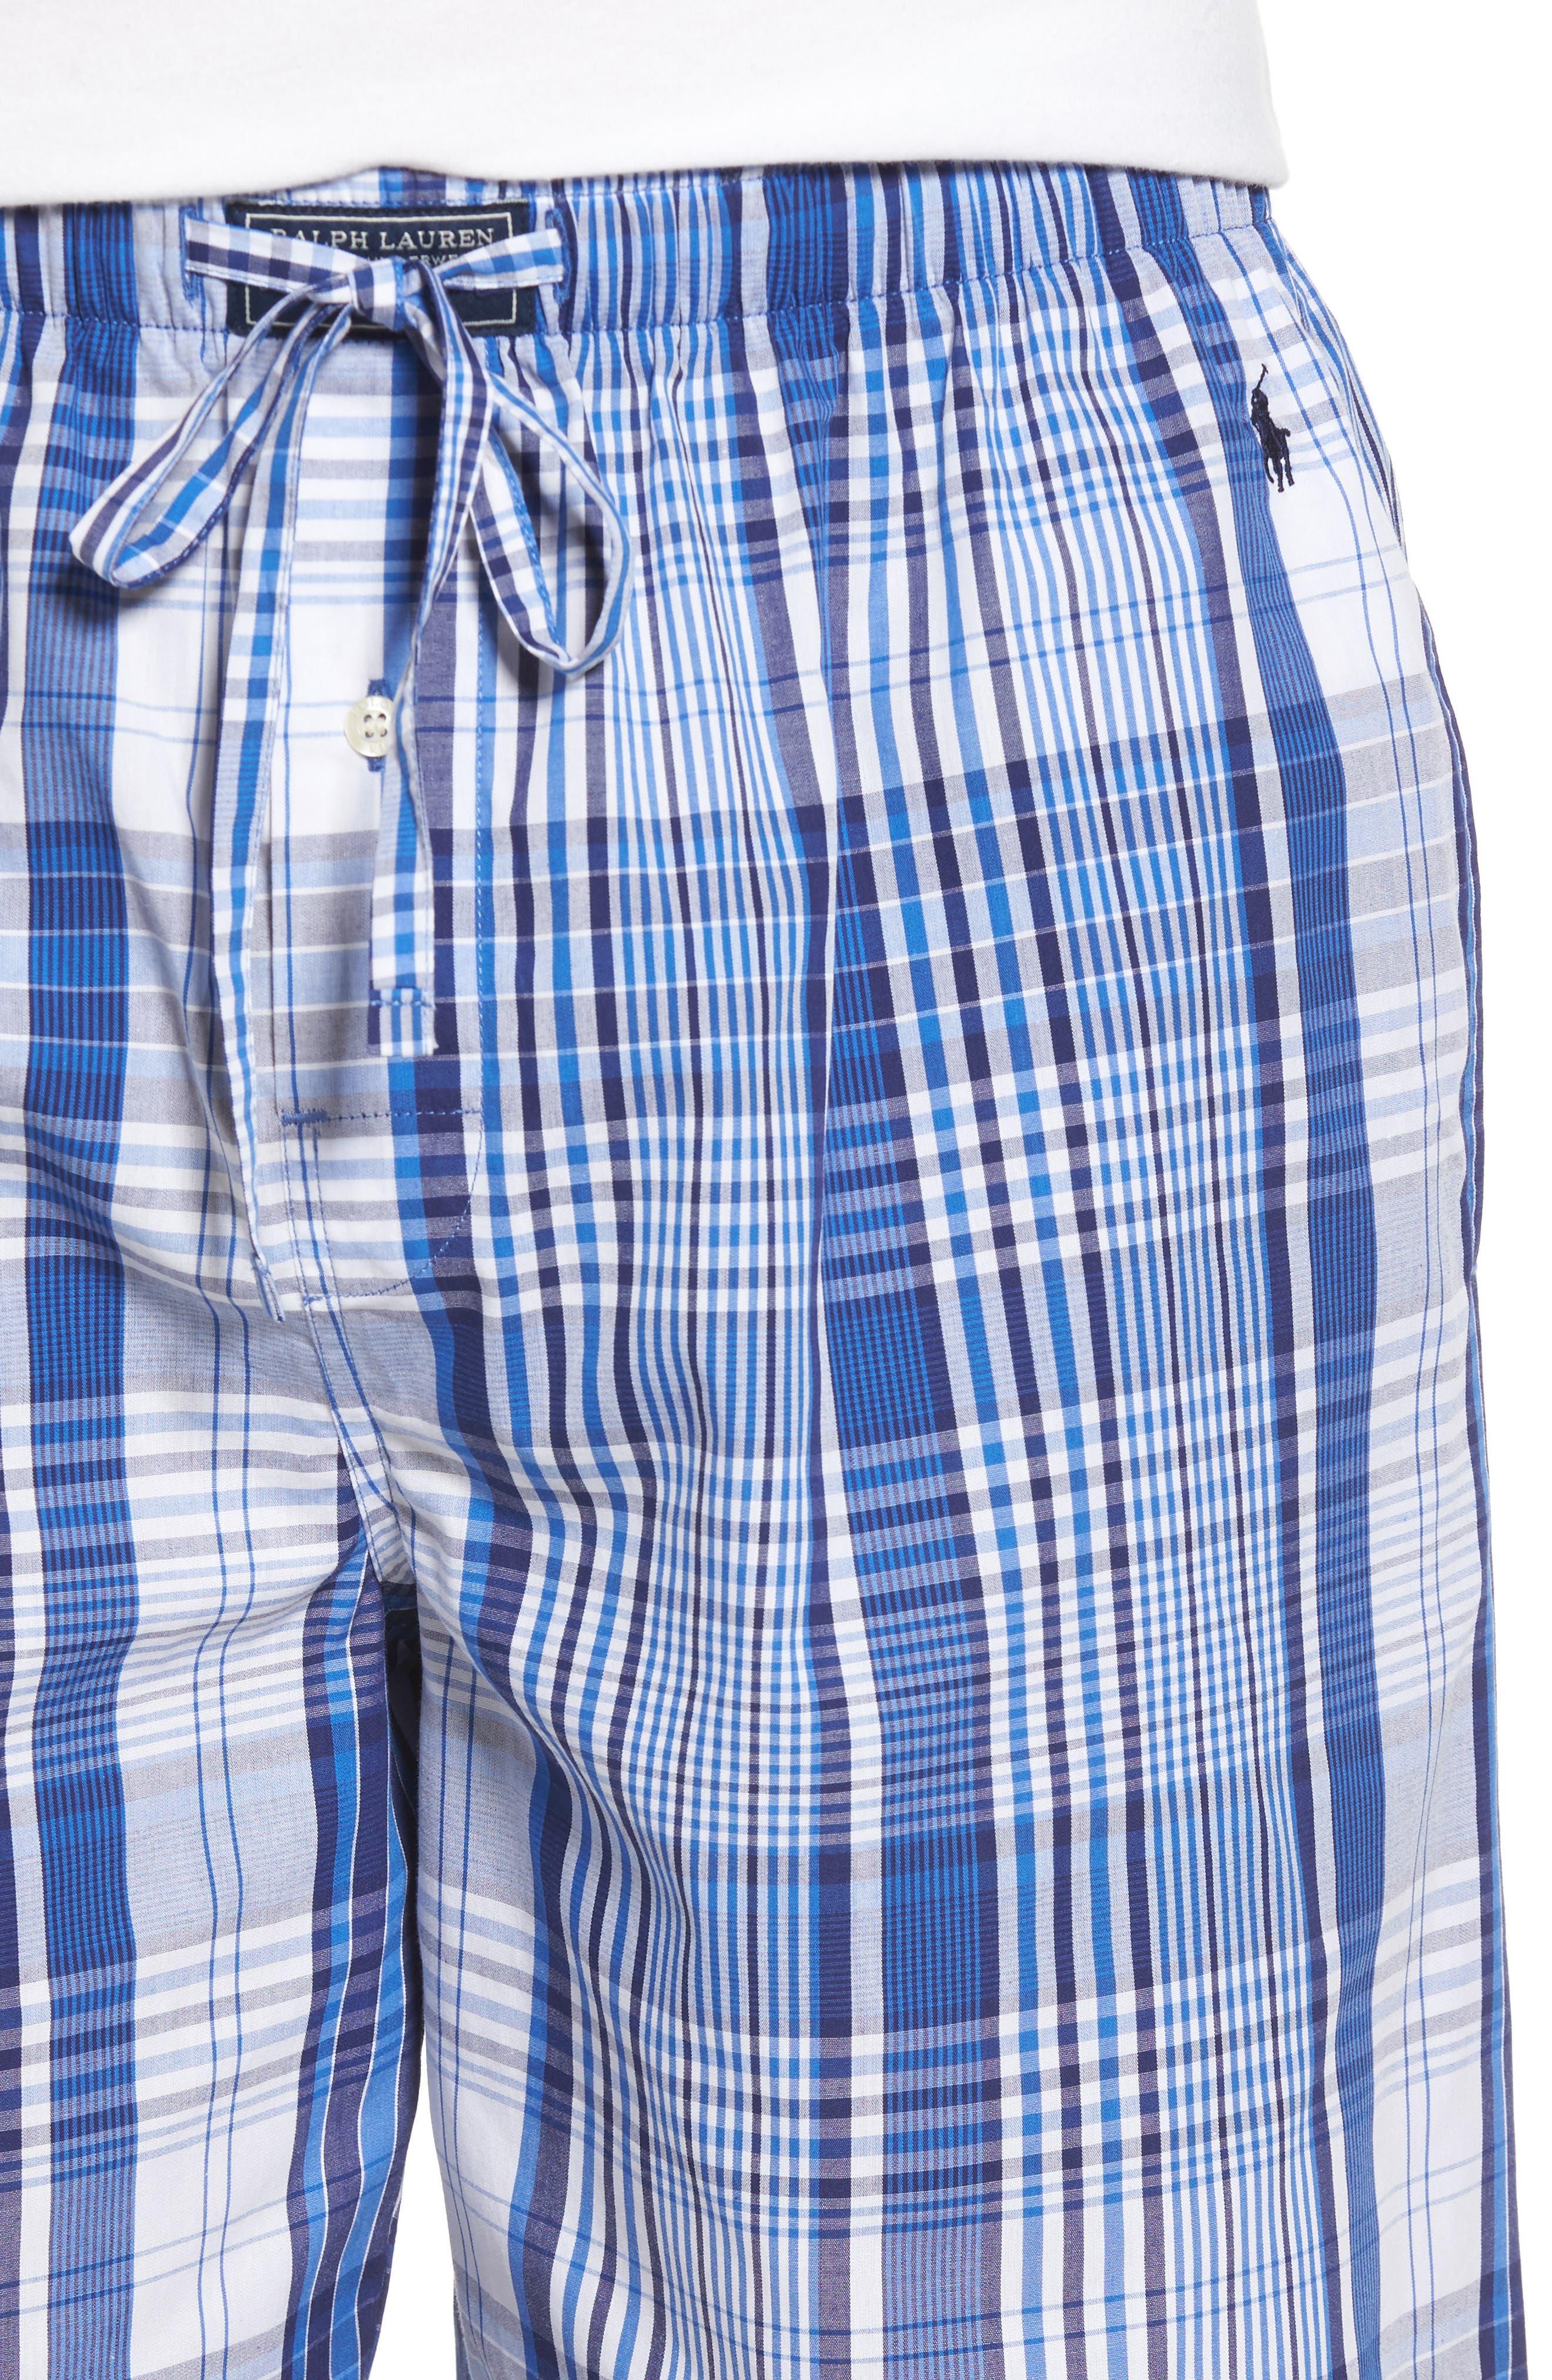 Cotton Pajama Shorts,                             Alternate thumbnail 4, color,                             406